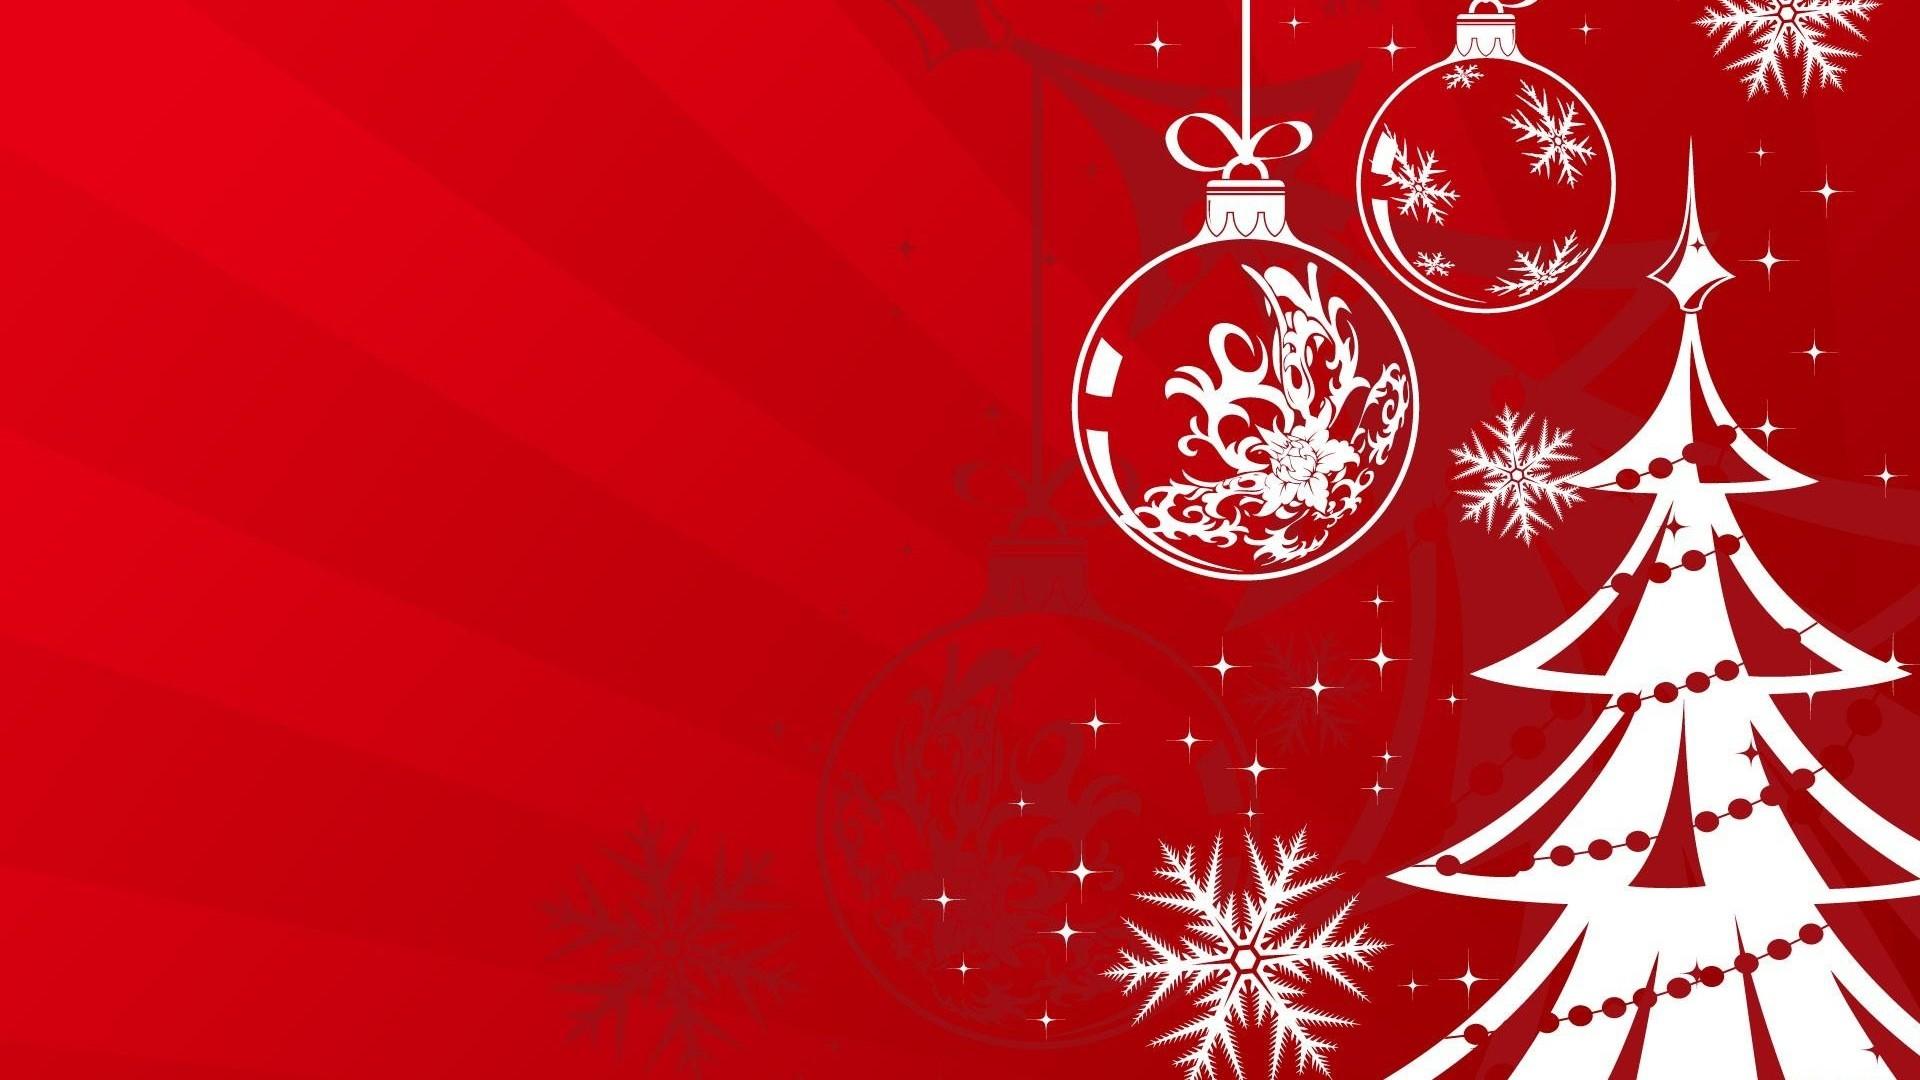 … christmas decorations, balloons, tree